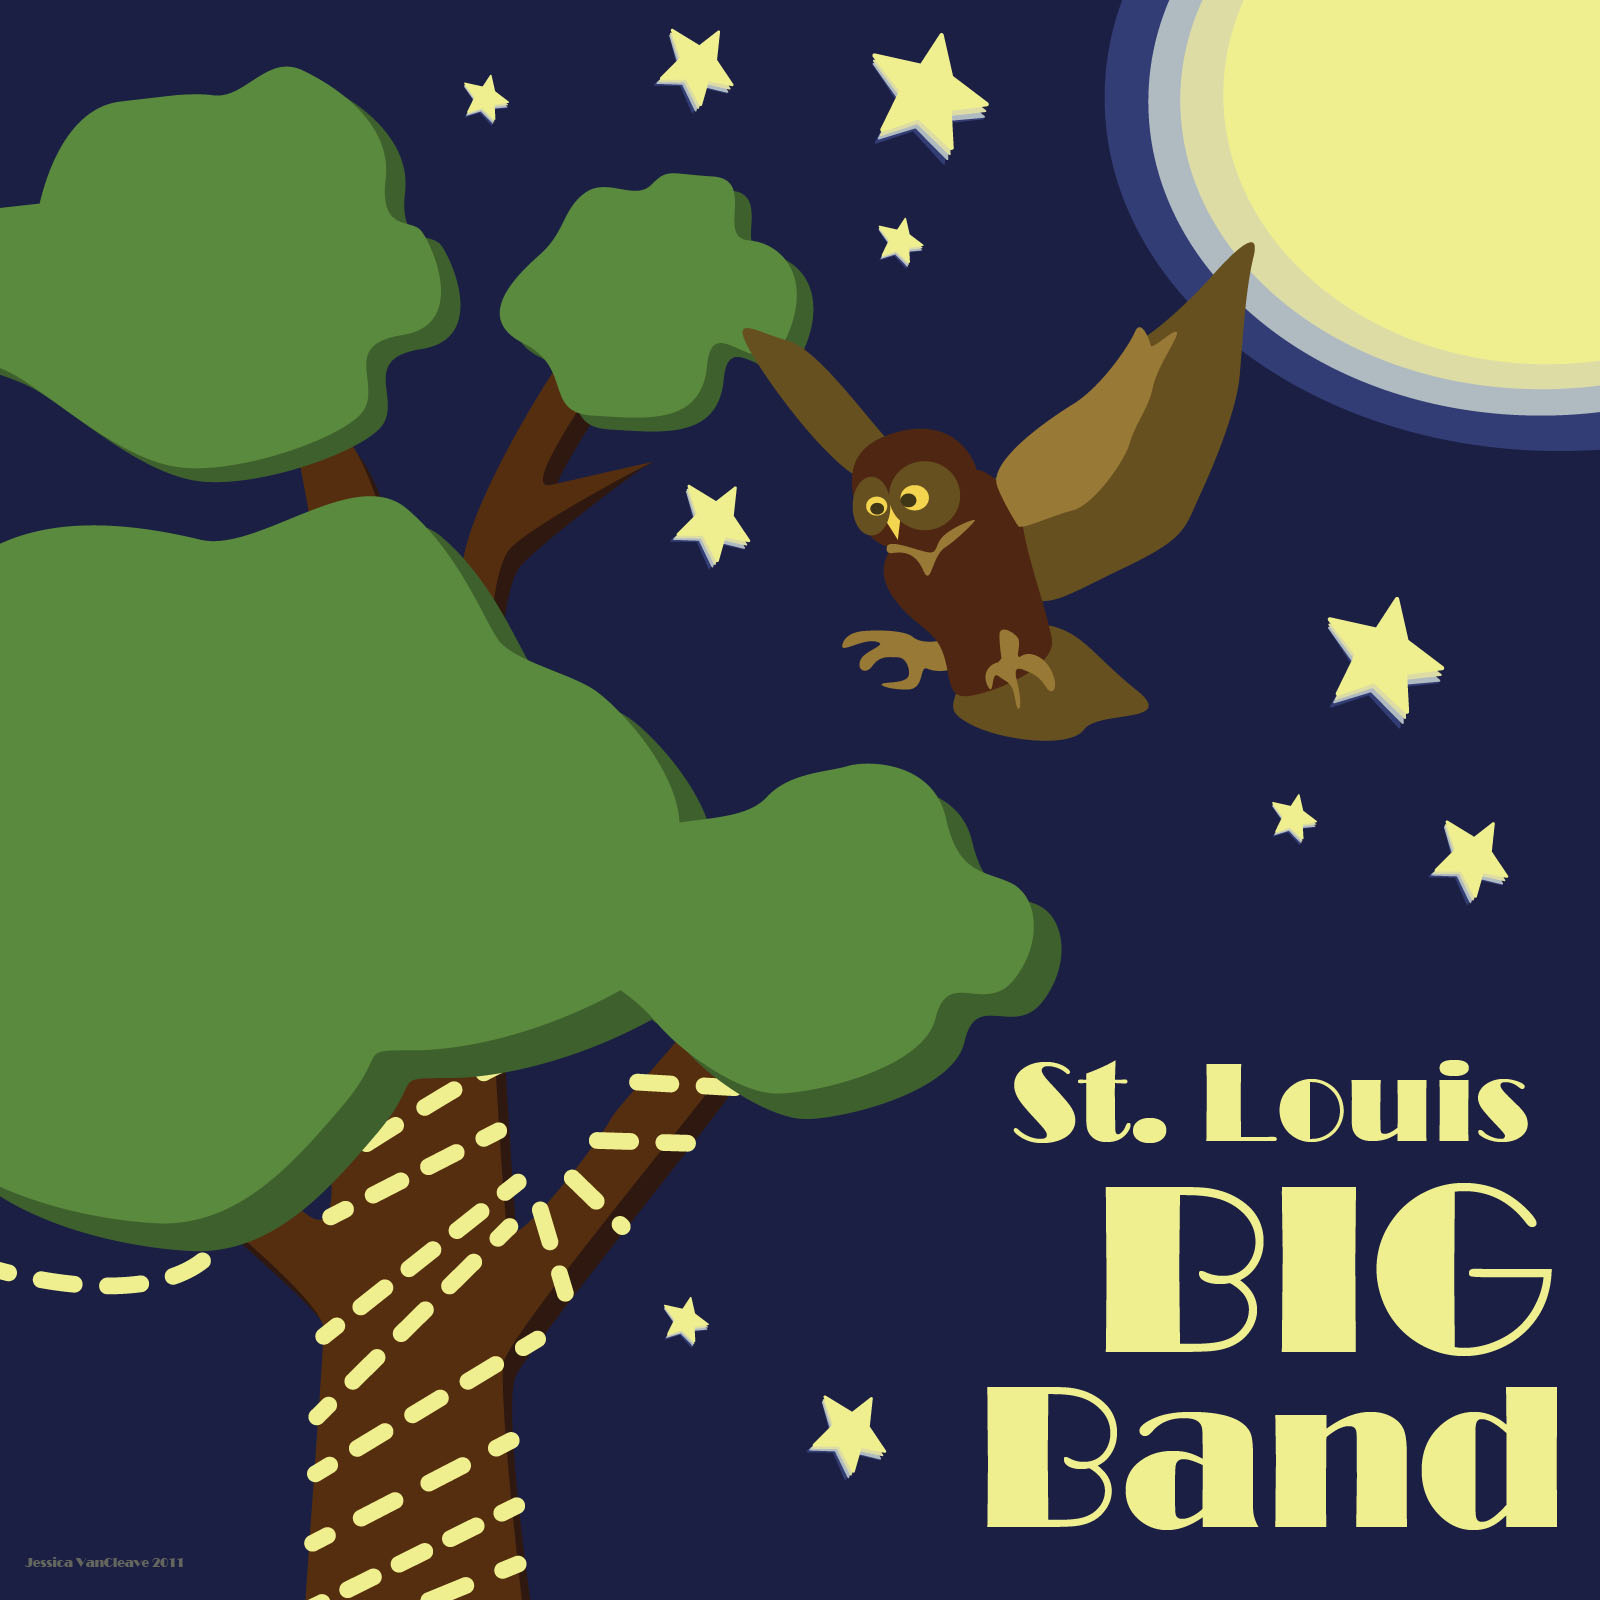 St. Louis Big Band Album Art